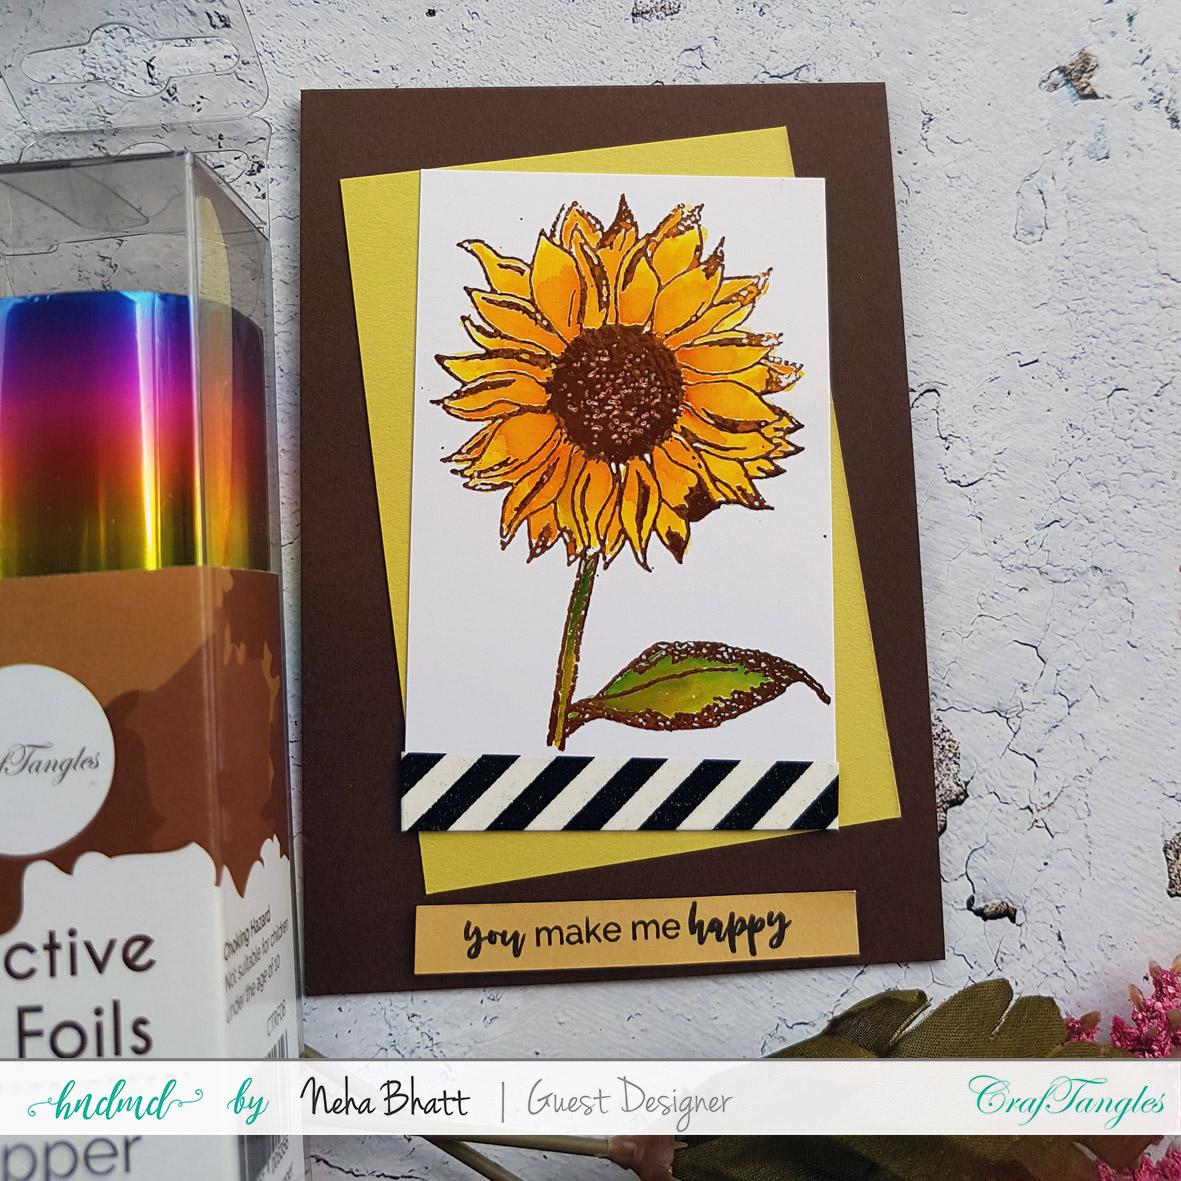 Foiled Cards by Neha Bhatt 11